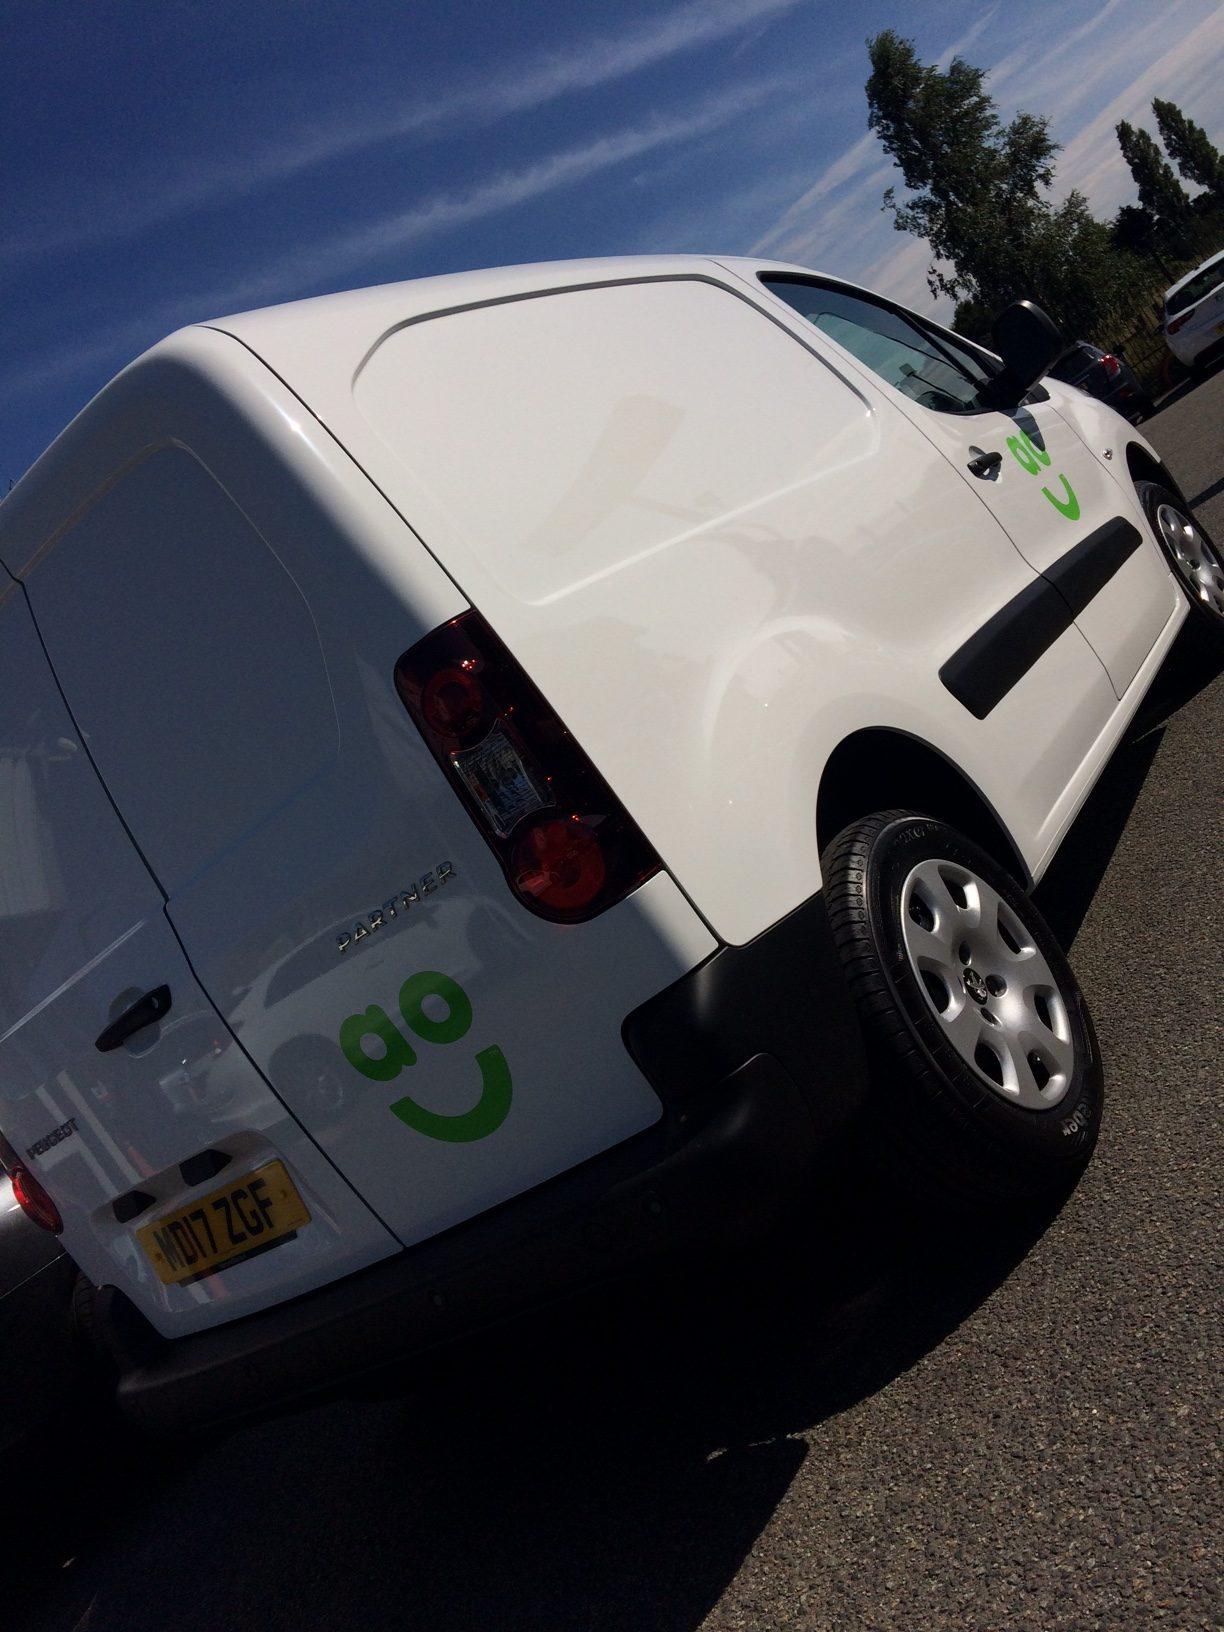 peugeot-partner-l1-diesel-850-1-6-bluehdi-100-professional-van-non-ss-leasing-information